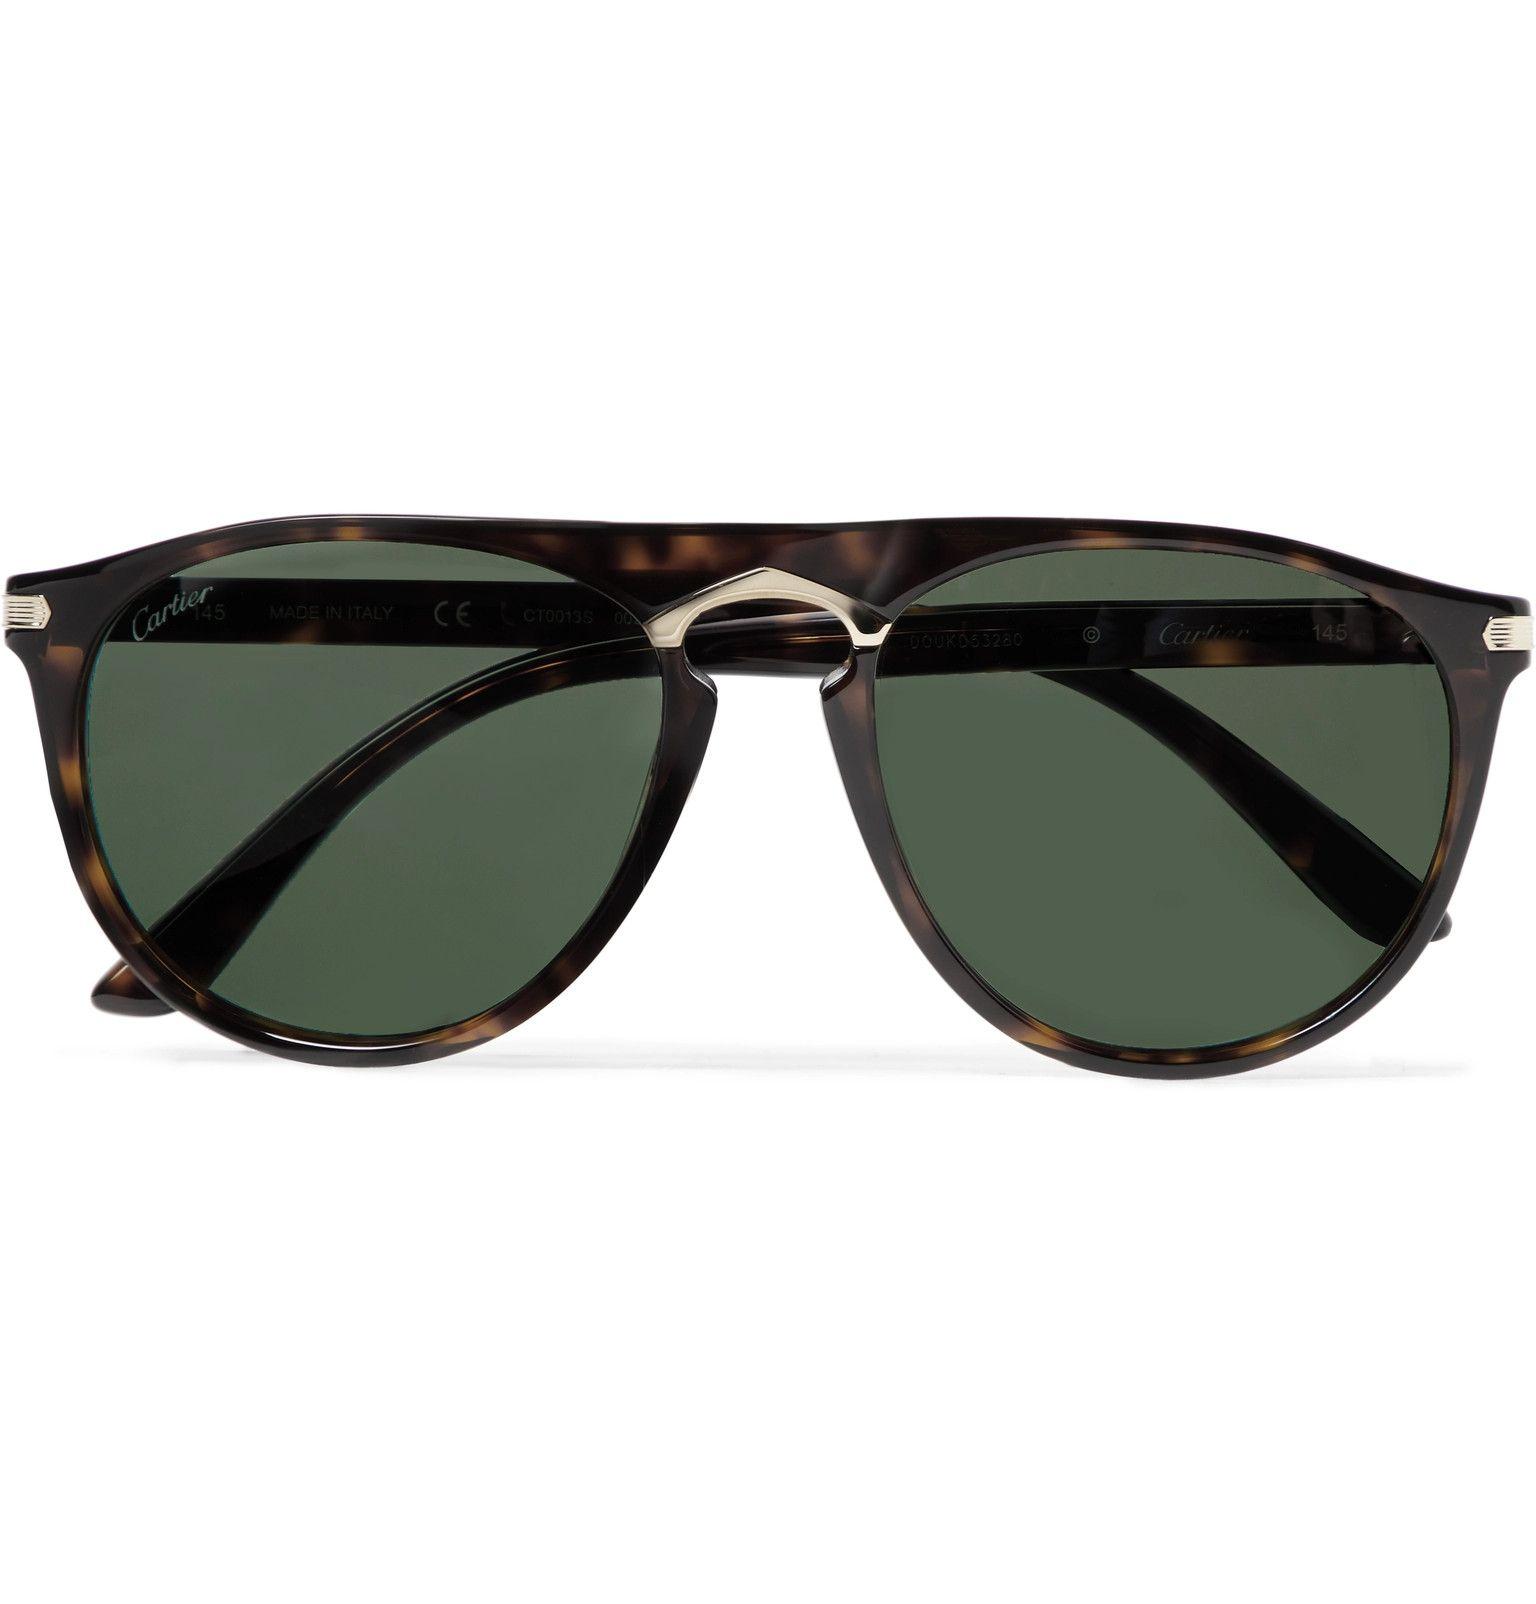 Tortoiseshell Aviator-Style Tortoiseshell Acetate and Gold-Tone Sunglasses   Cartier Eyewear